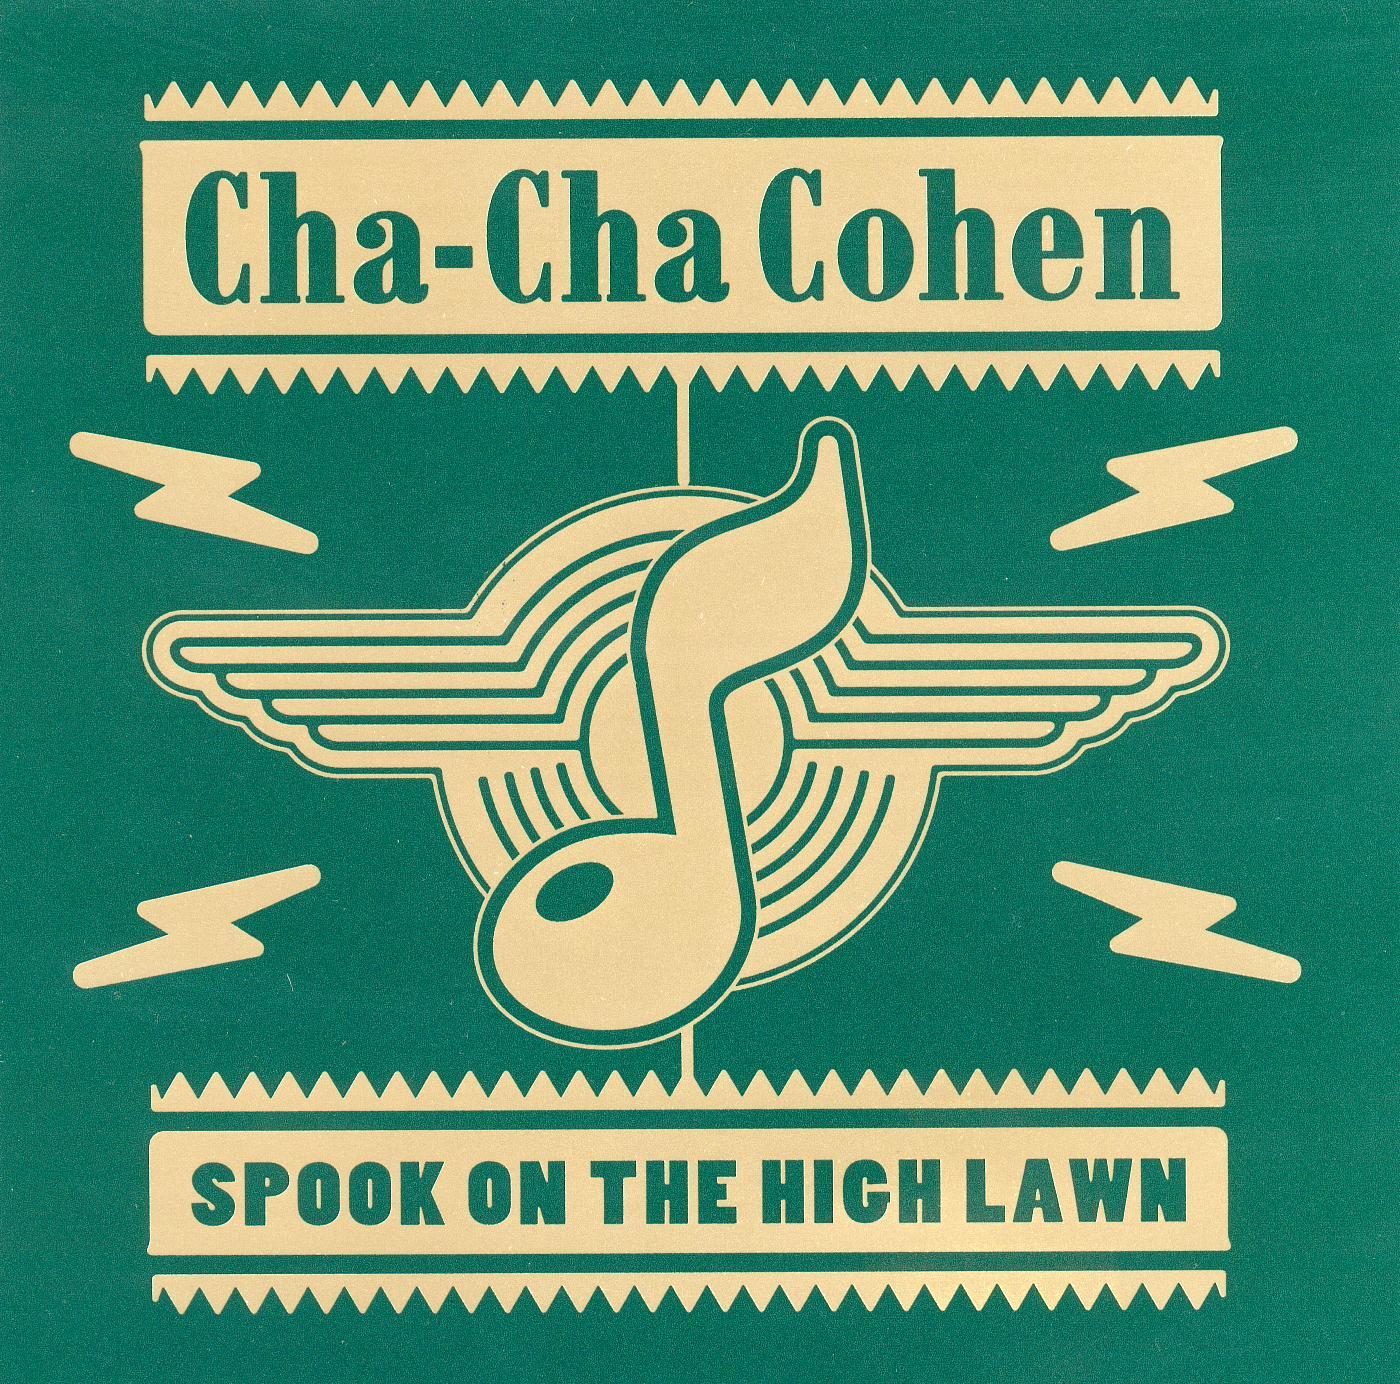 Cha Cha Cohen - Spook On The High Lawn - Digital EP (1997) - Cha Cha Cohen